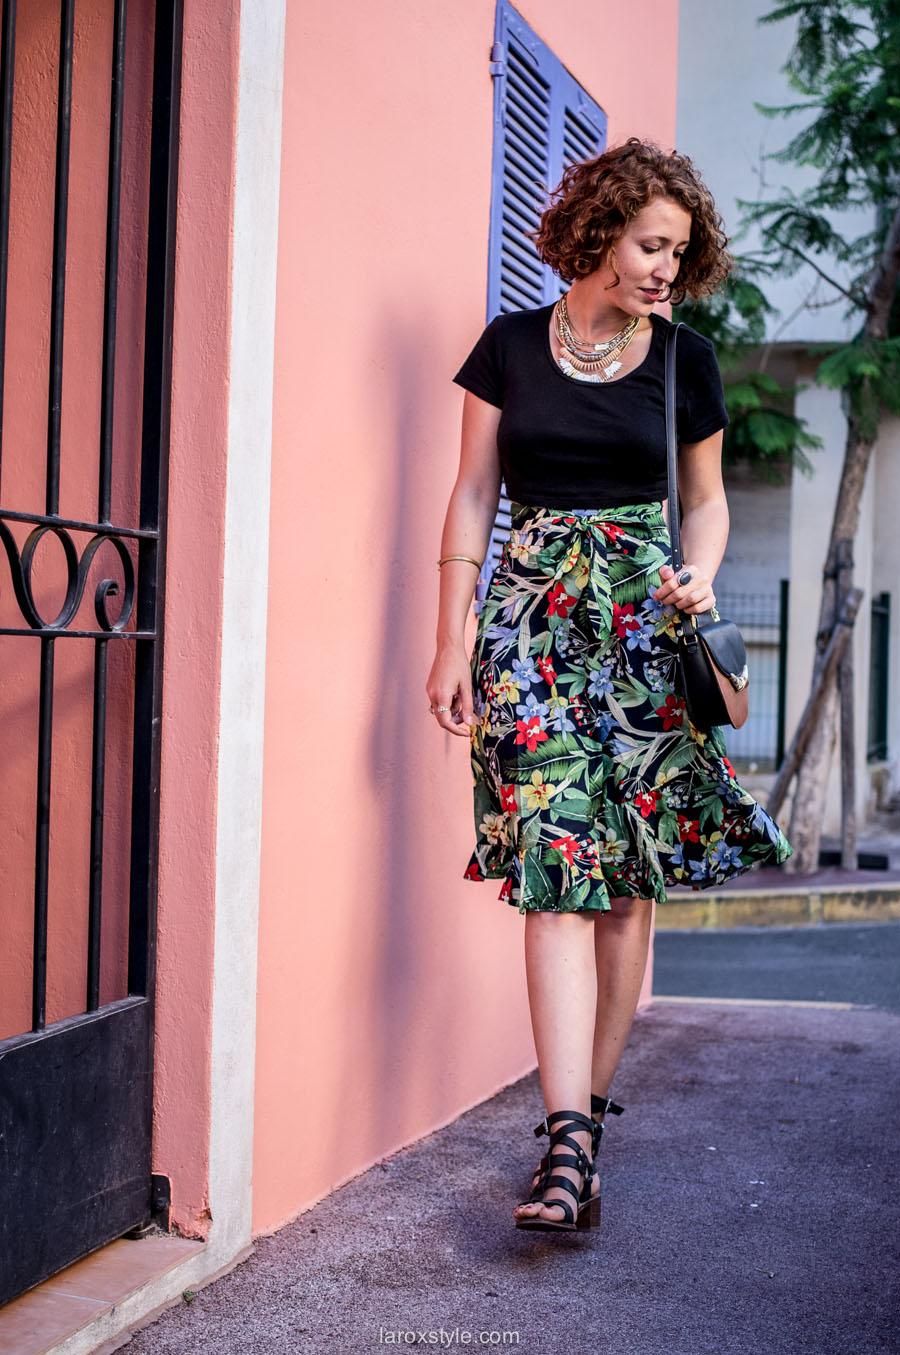 look femme - Tendance palmiers - blog mode lyon